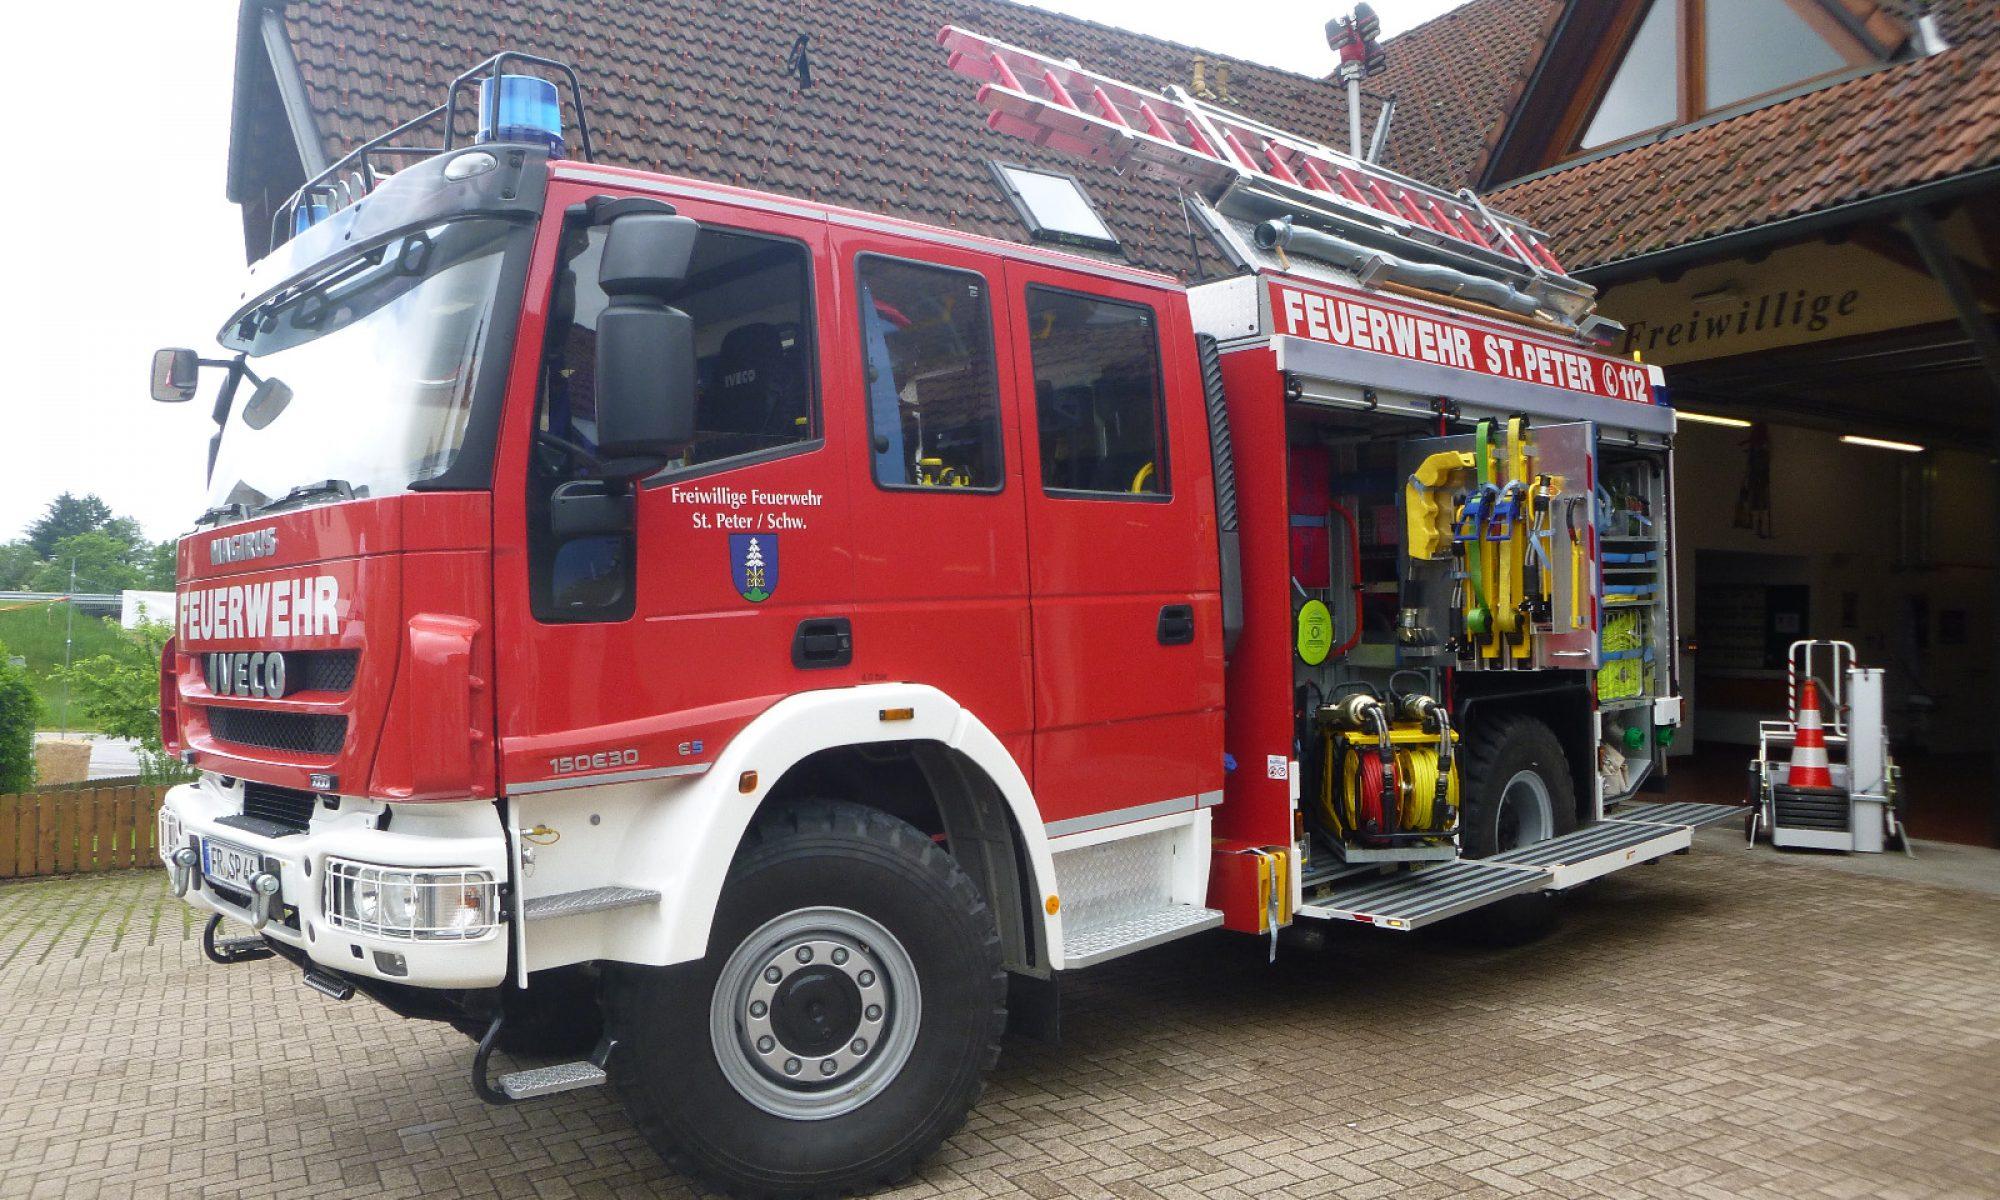 Freiwillige Feuerwehr St. Peter